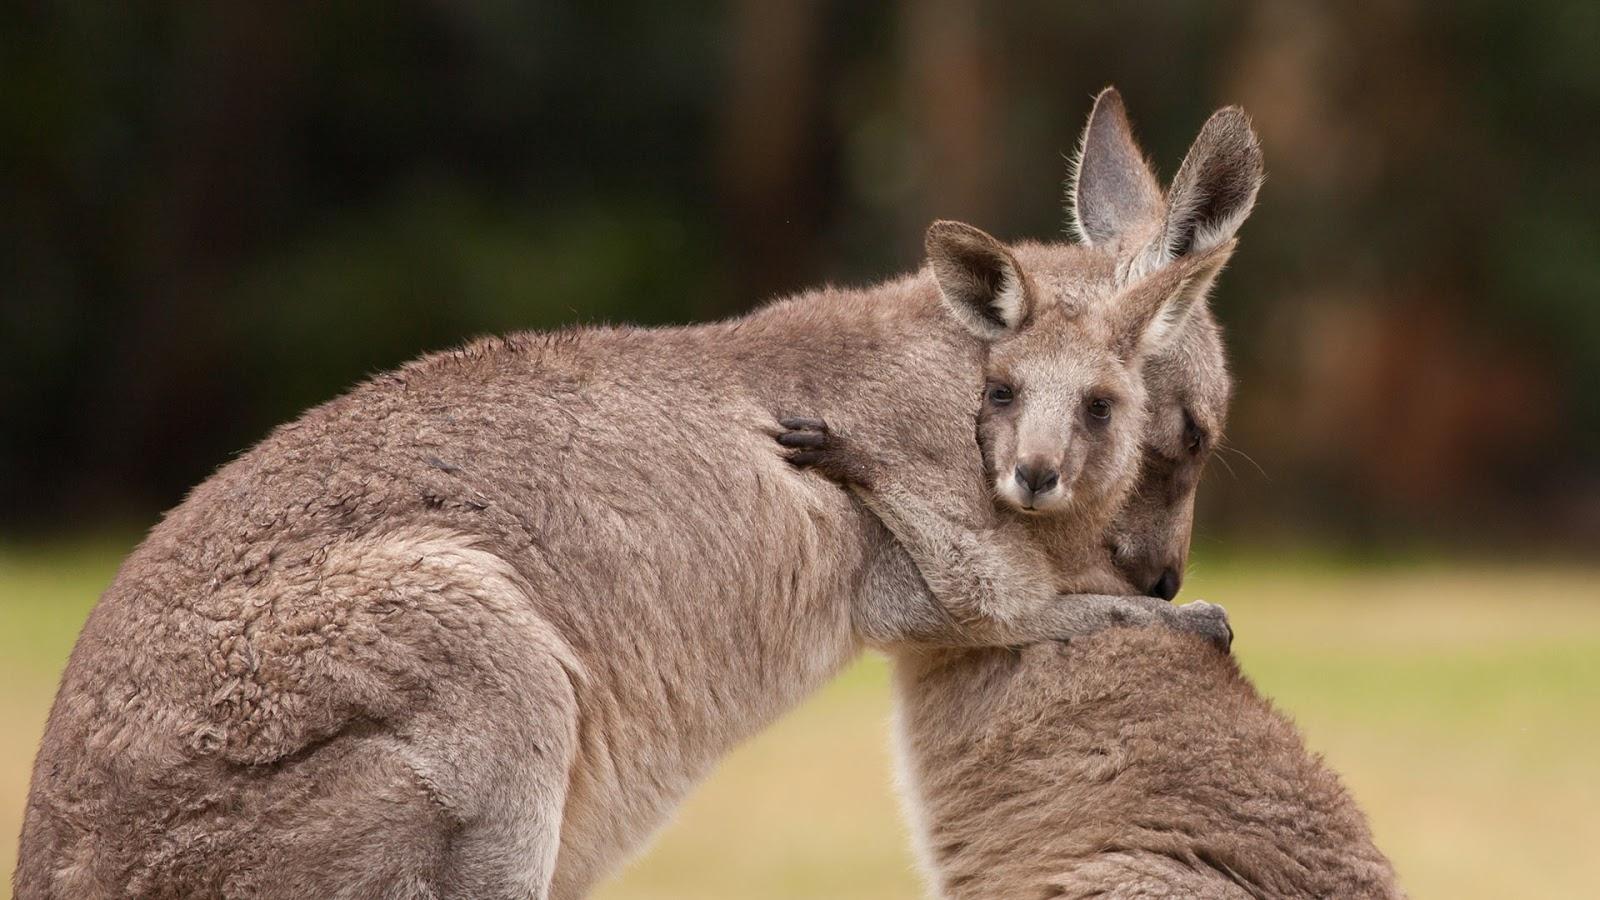 Mother and baby kangaroos hugging © Belle Ciezak/Shutterstock